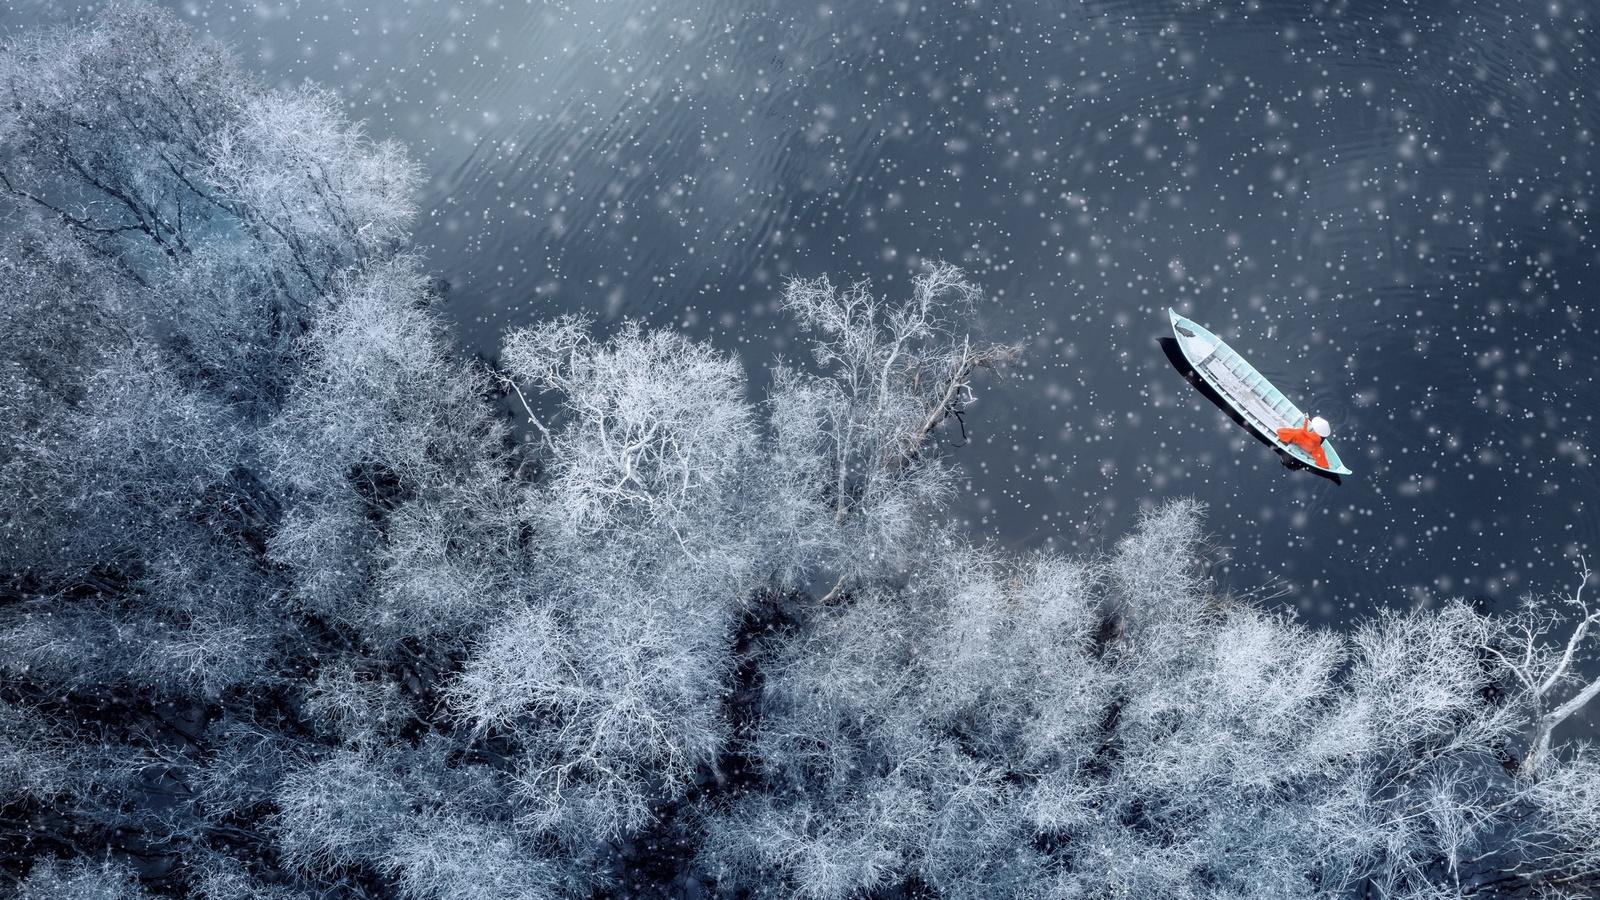 boat-snow-winter-aerial-view-hc.jpg